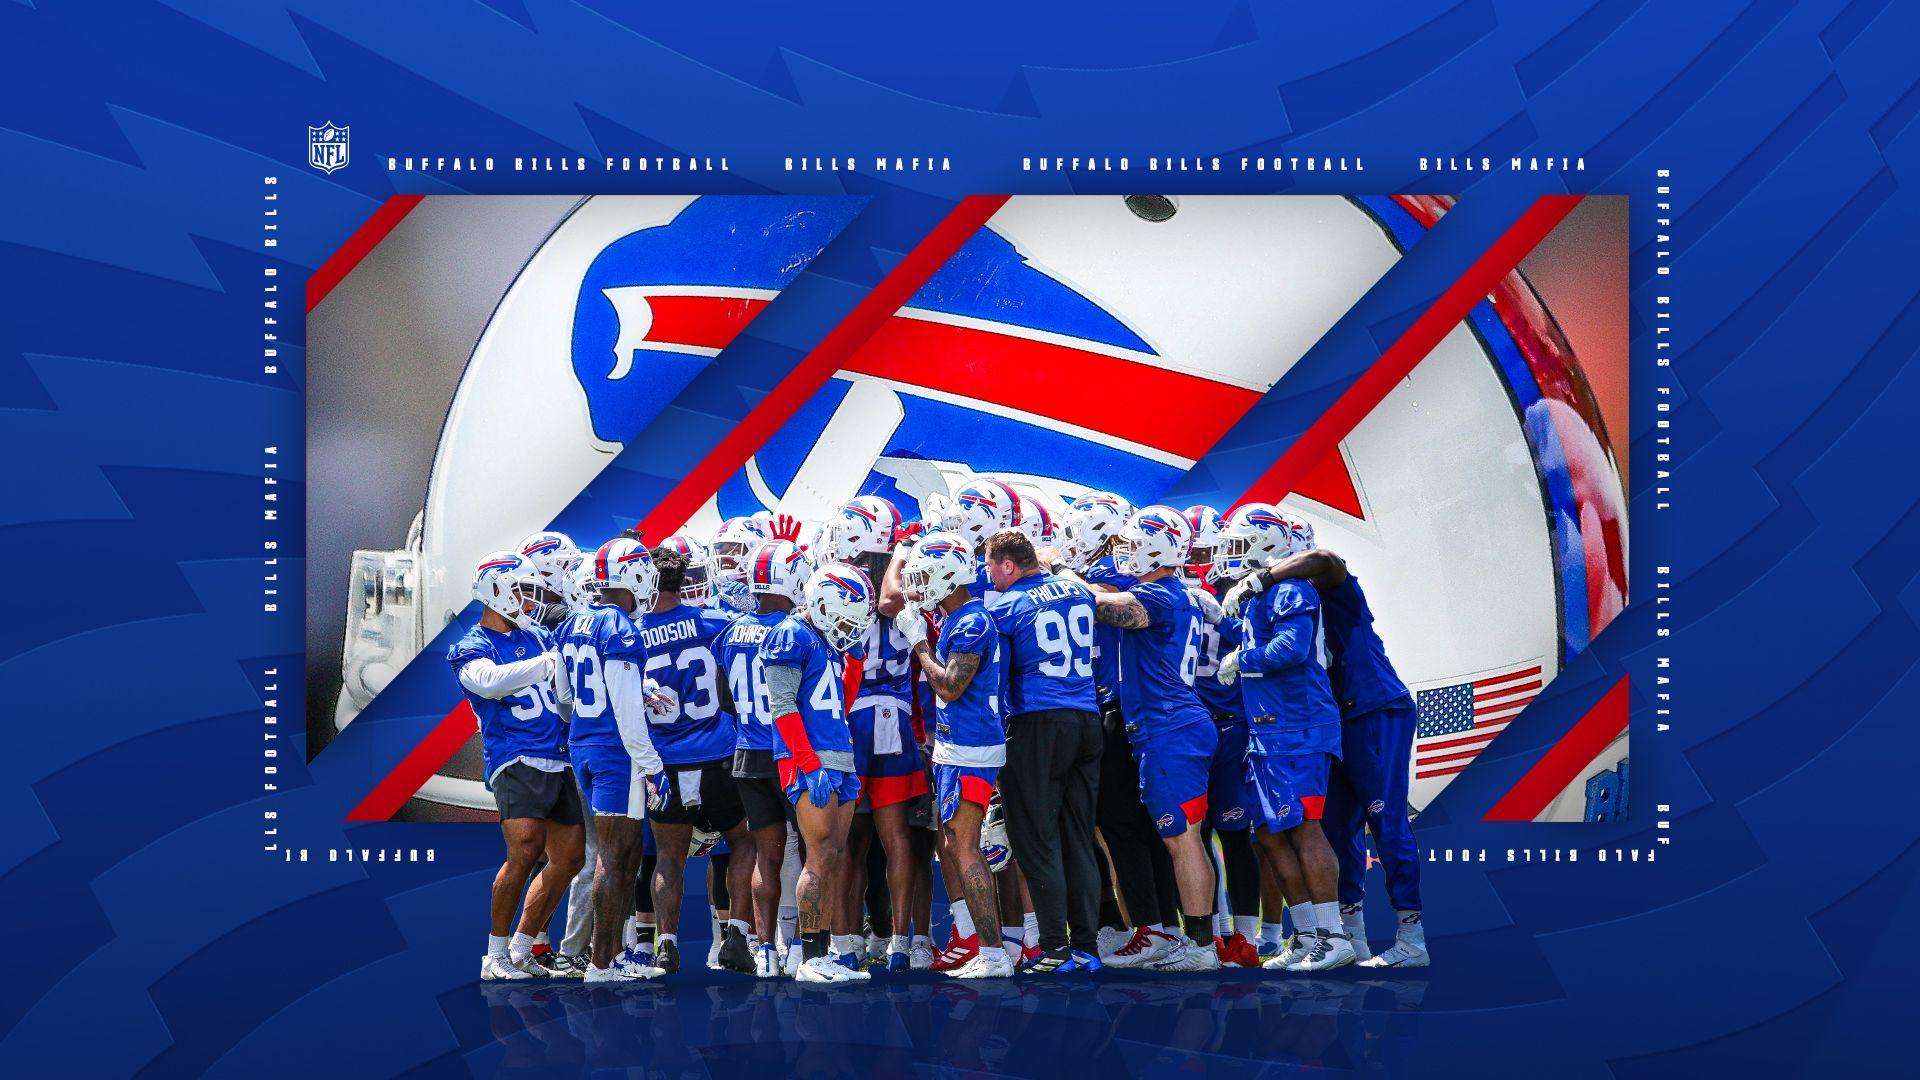 Buffalo Bills Wallpapers   Buffalo Bills - buffalobills.com